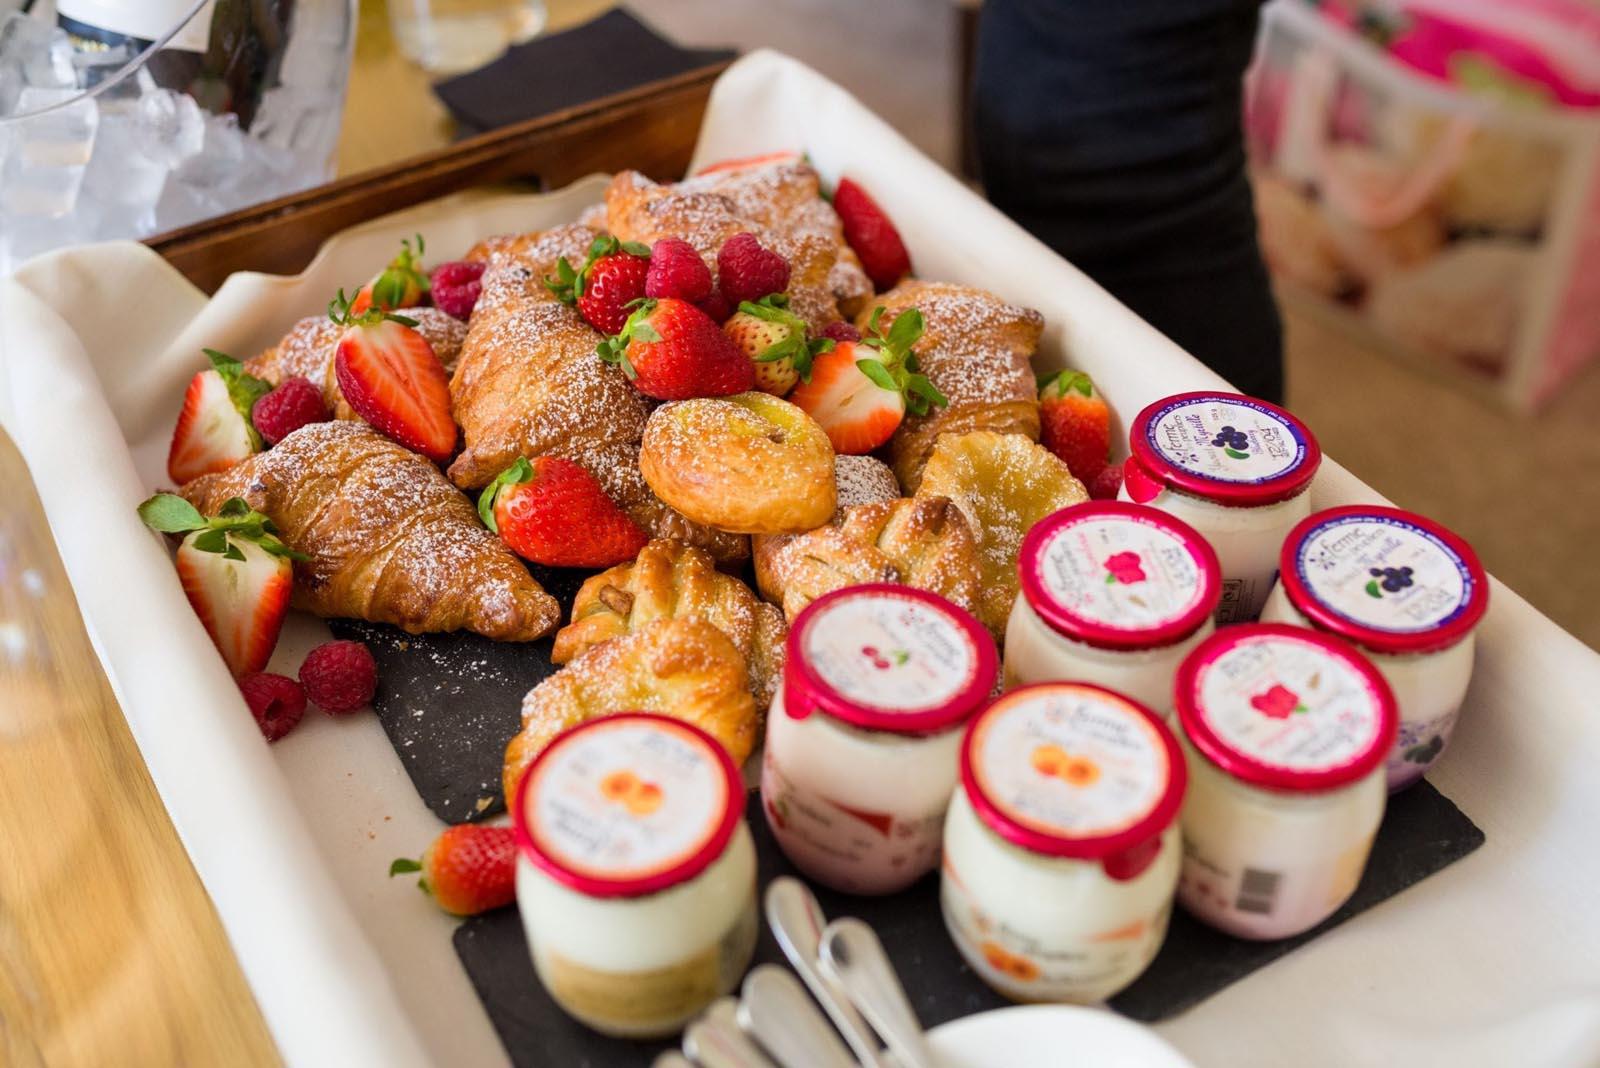 Selection of breakfast food